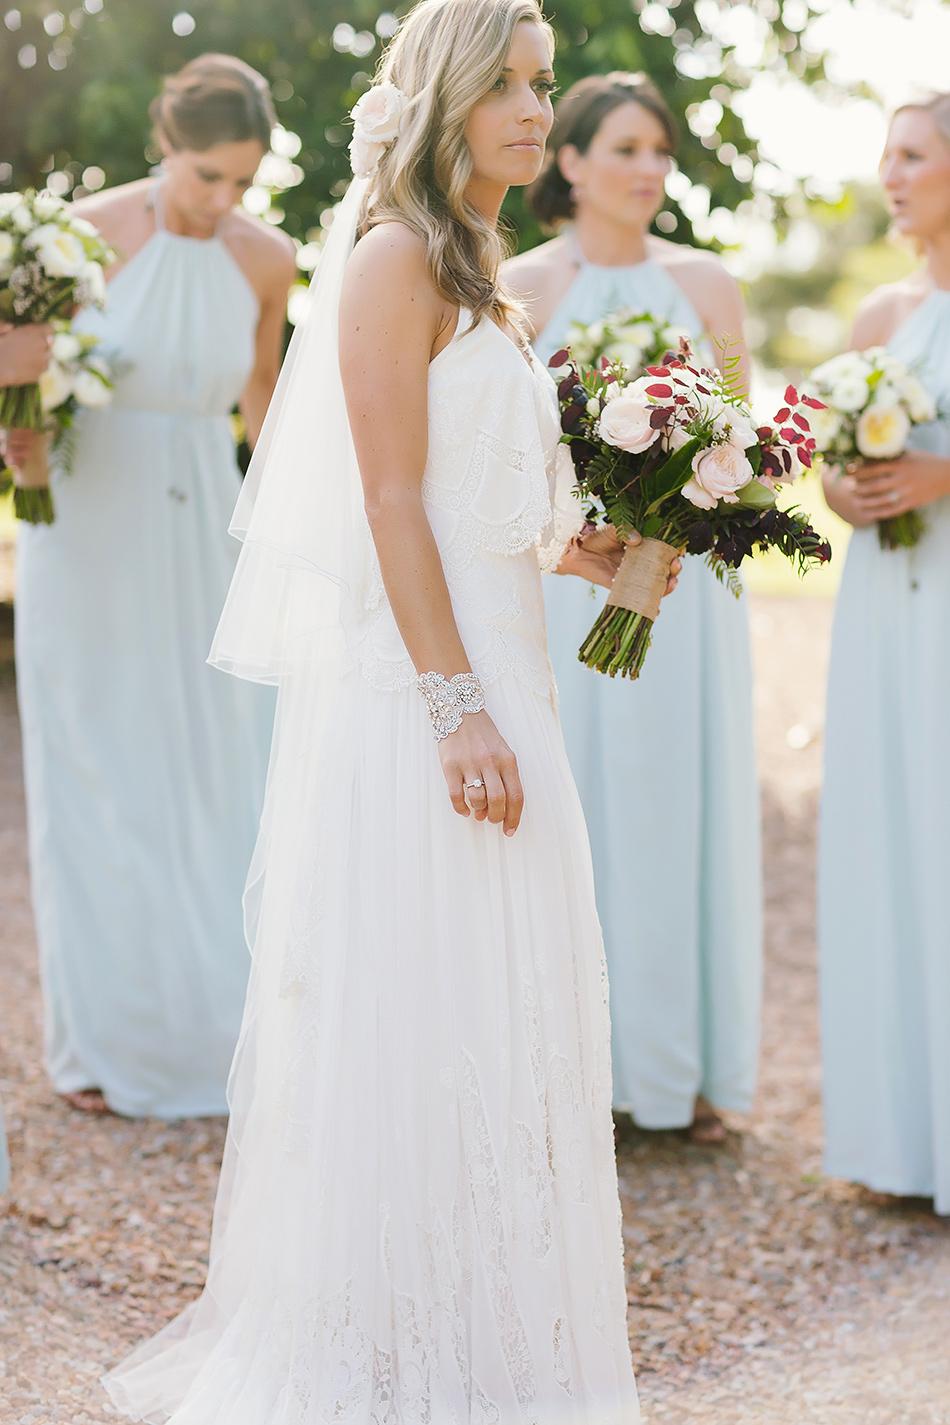 cool wedding photographer natural light photographer brisbane wedding photographer byron bay wedding at earth house bridal dress